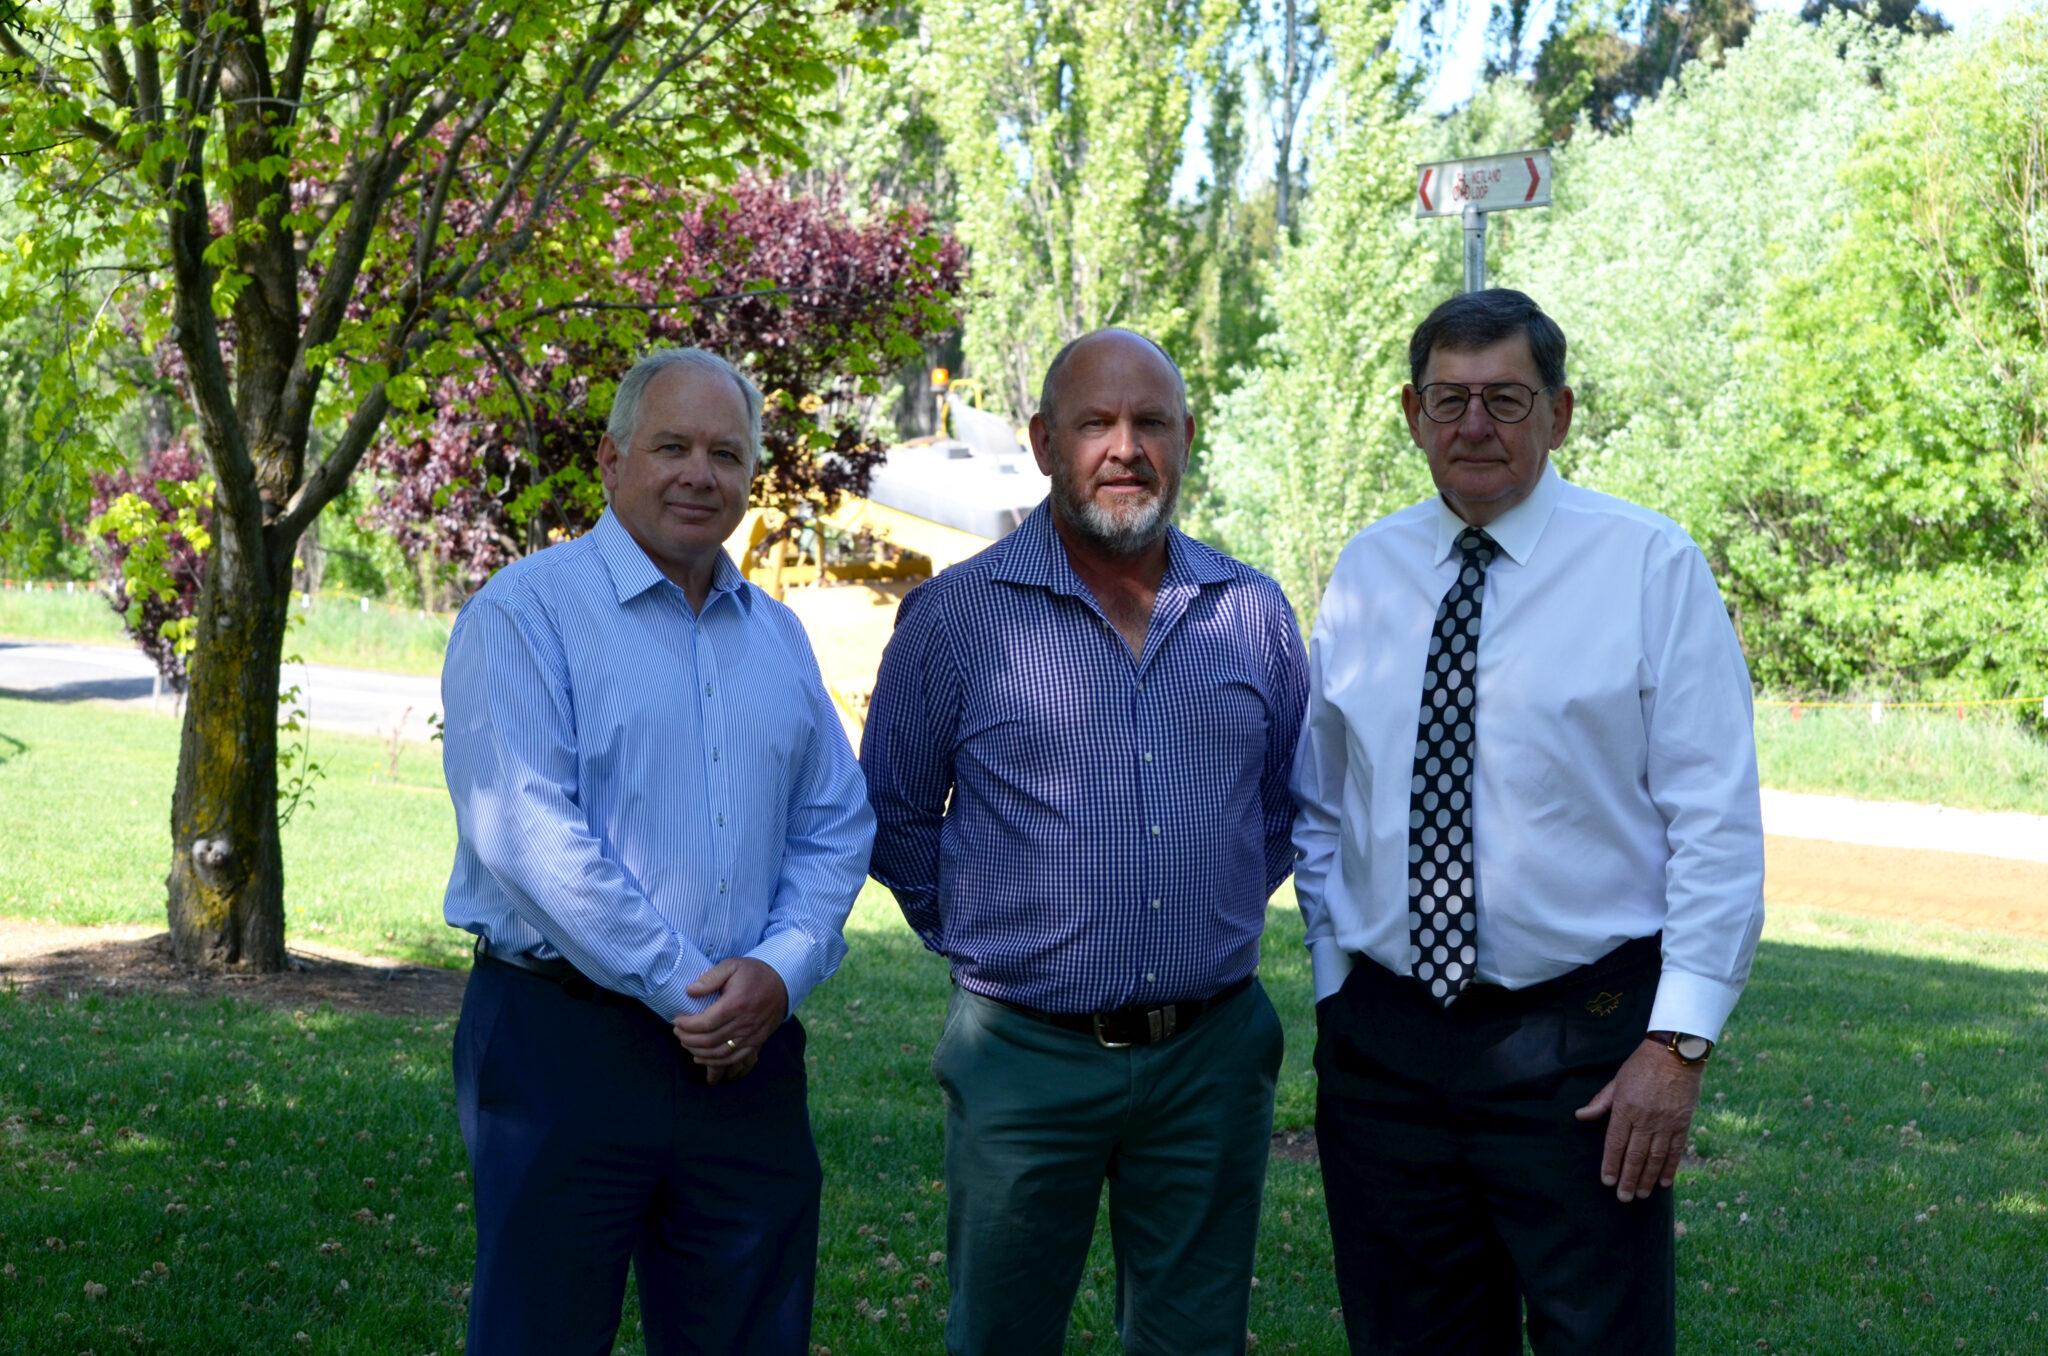 Cr Jeff Whitton, Cr Jason Hamling and Cr Reg Kidd check out the roadworks at Ploughmans Lane.